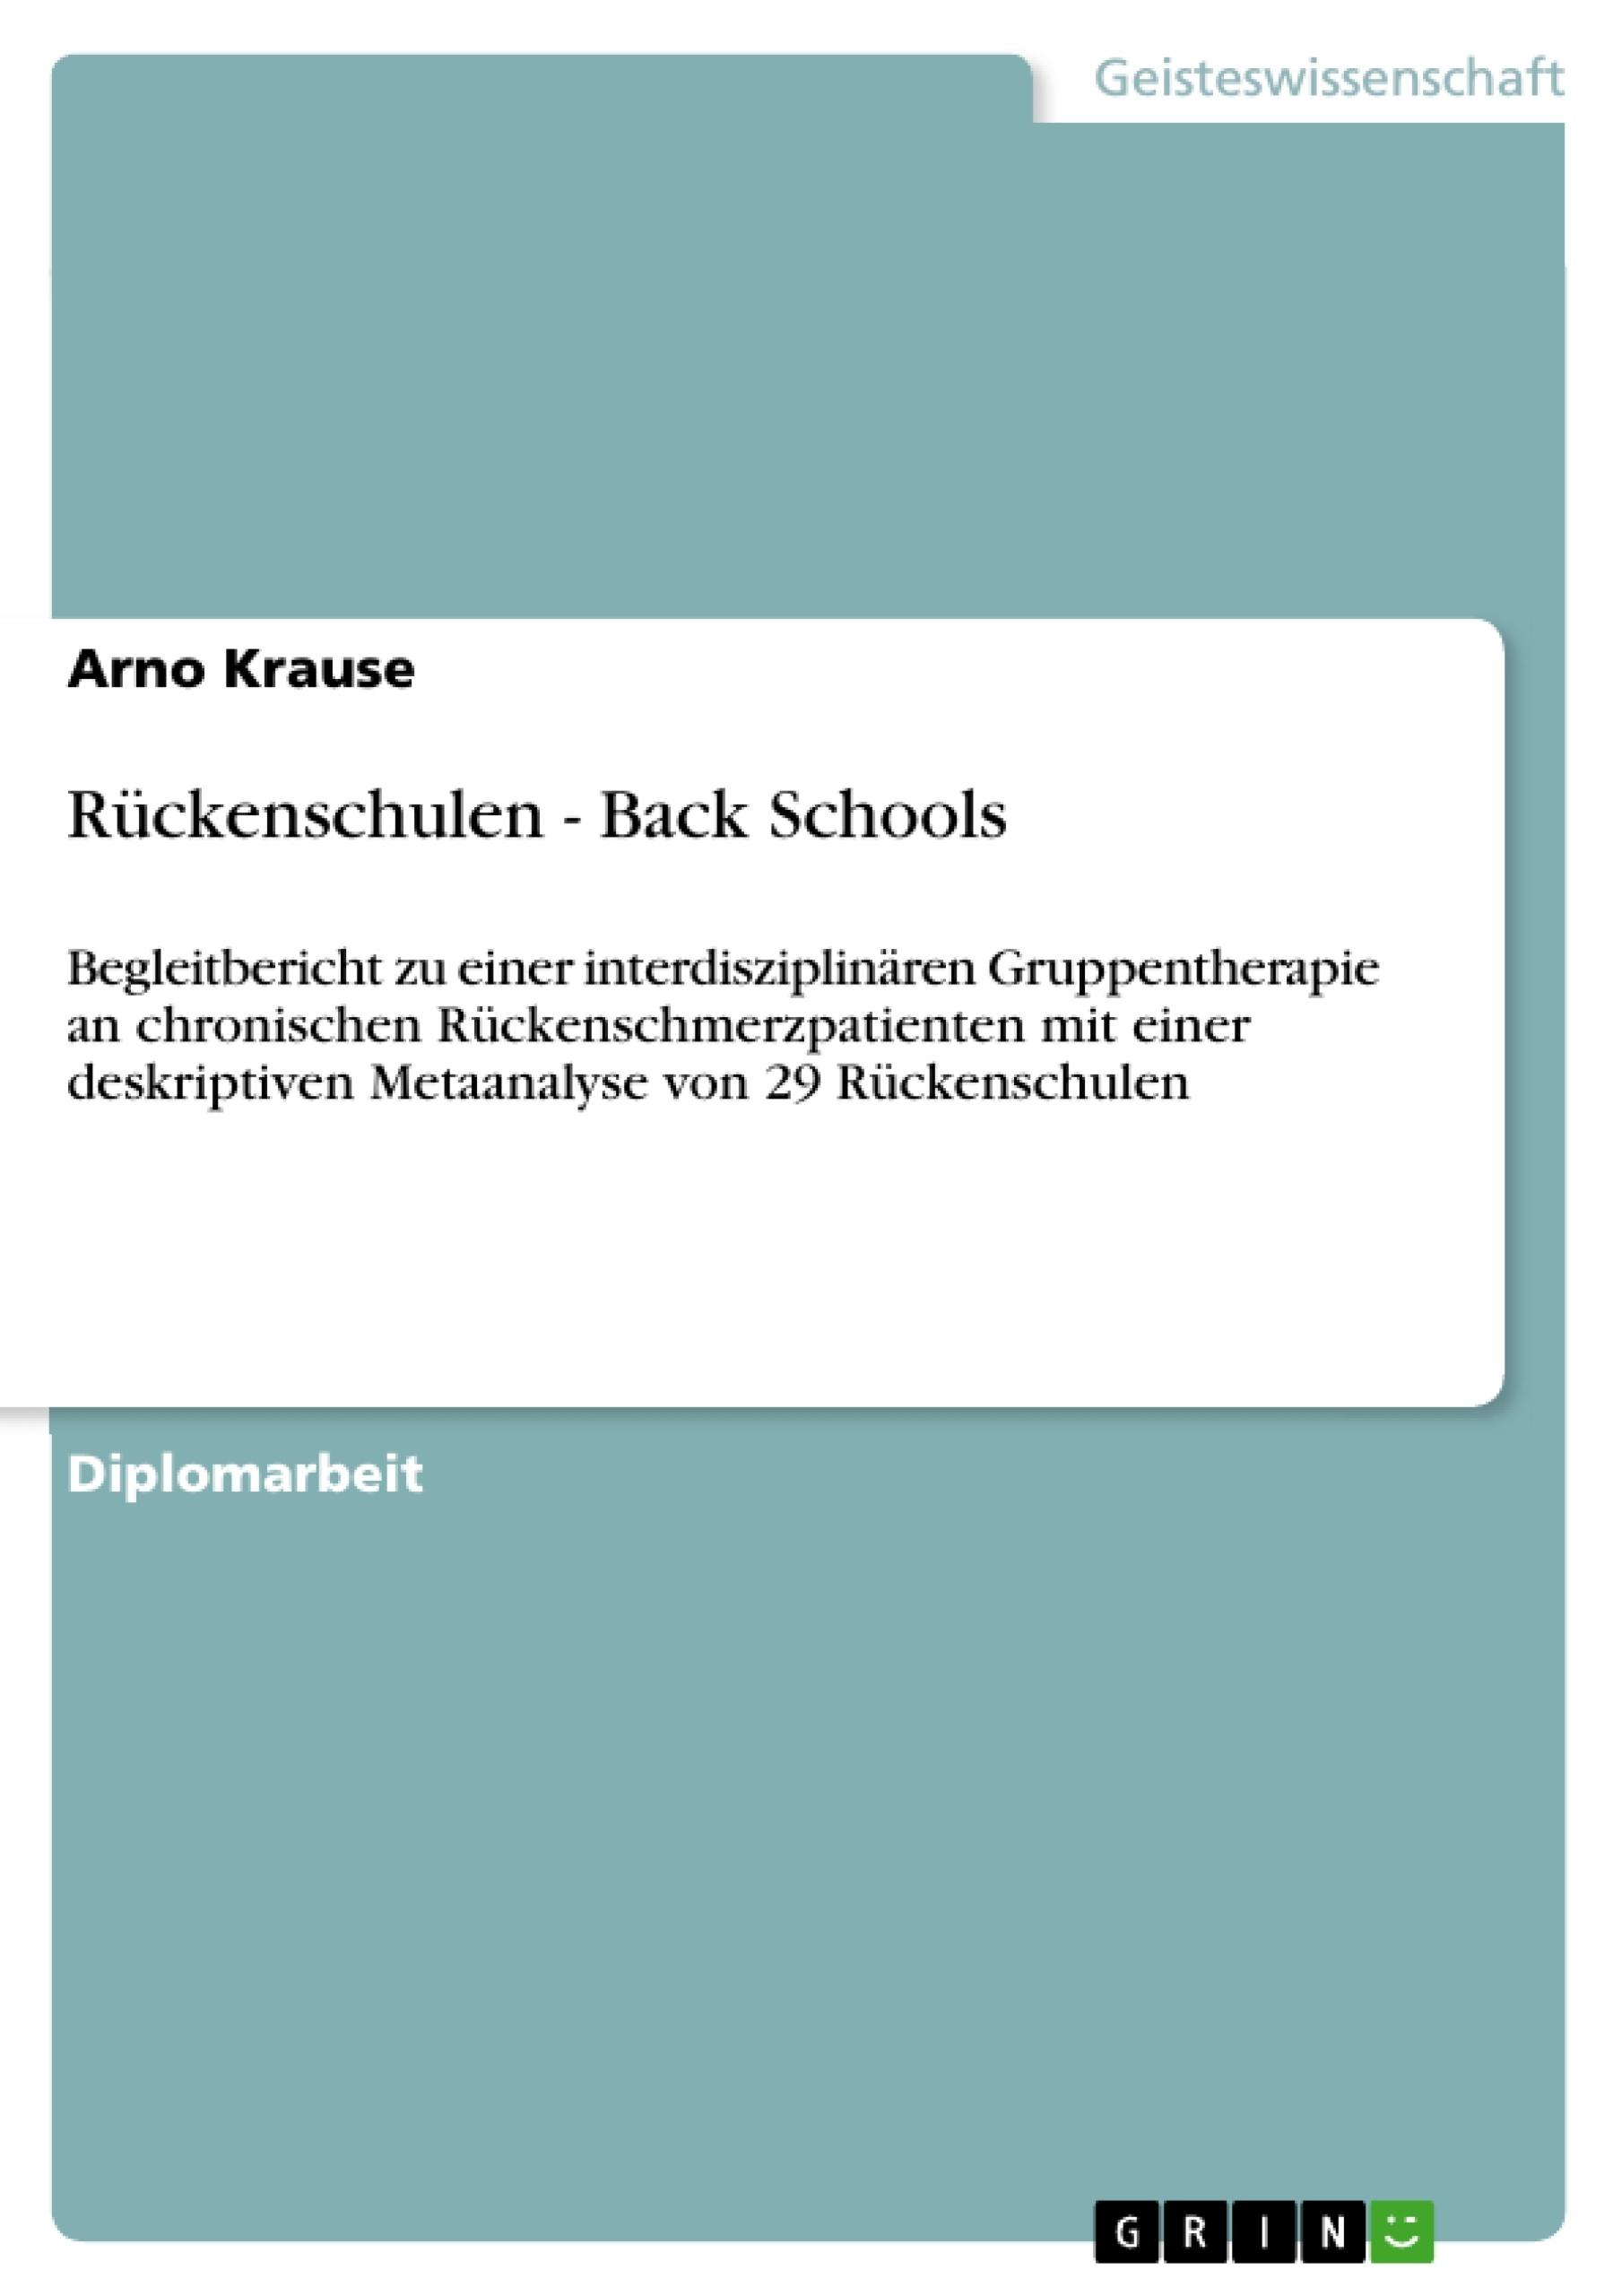 Titel: Rückenschulen - Back Schools